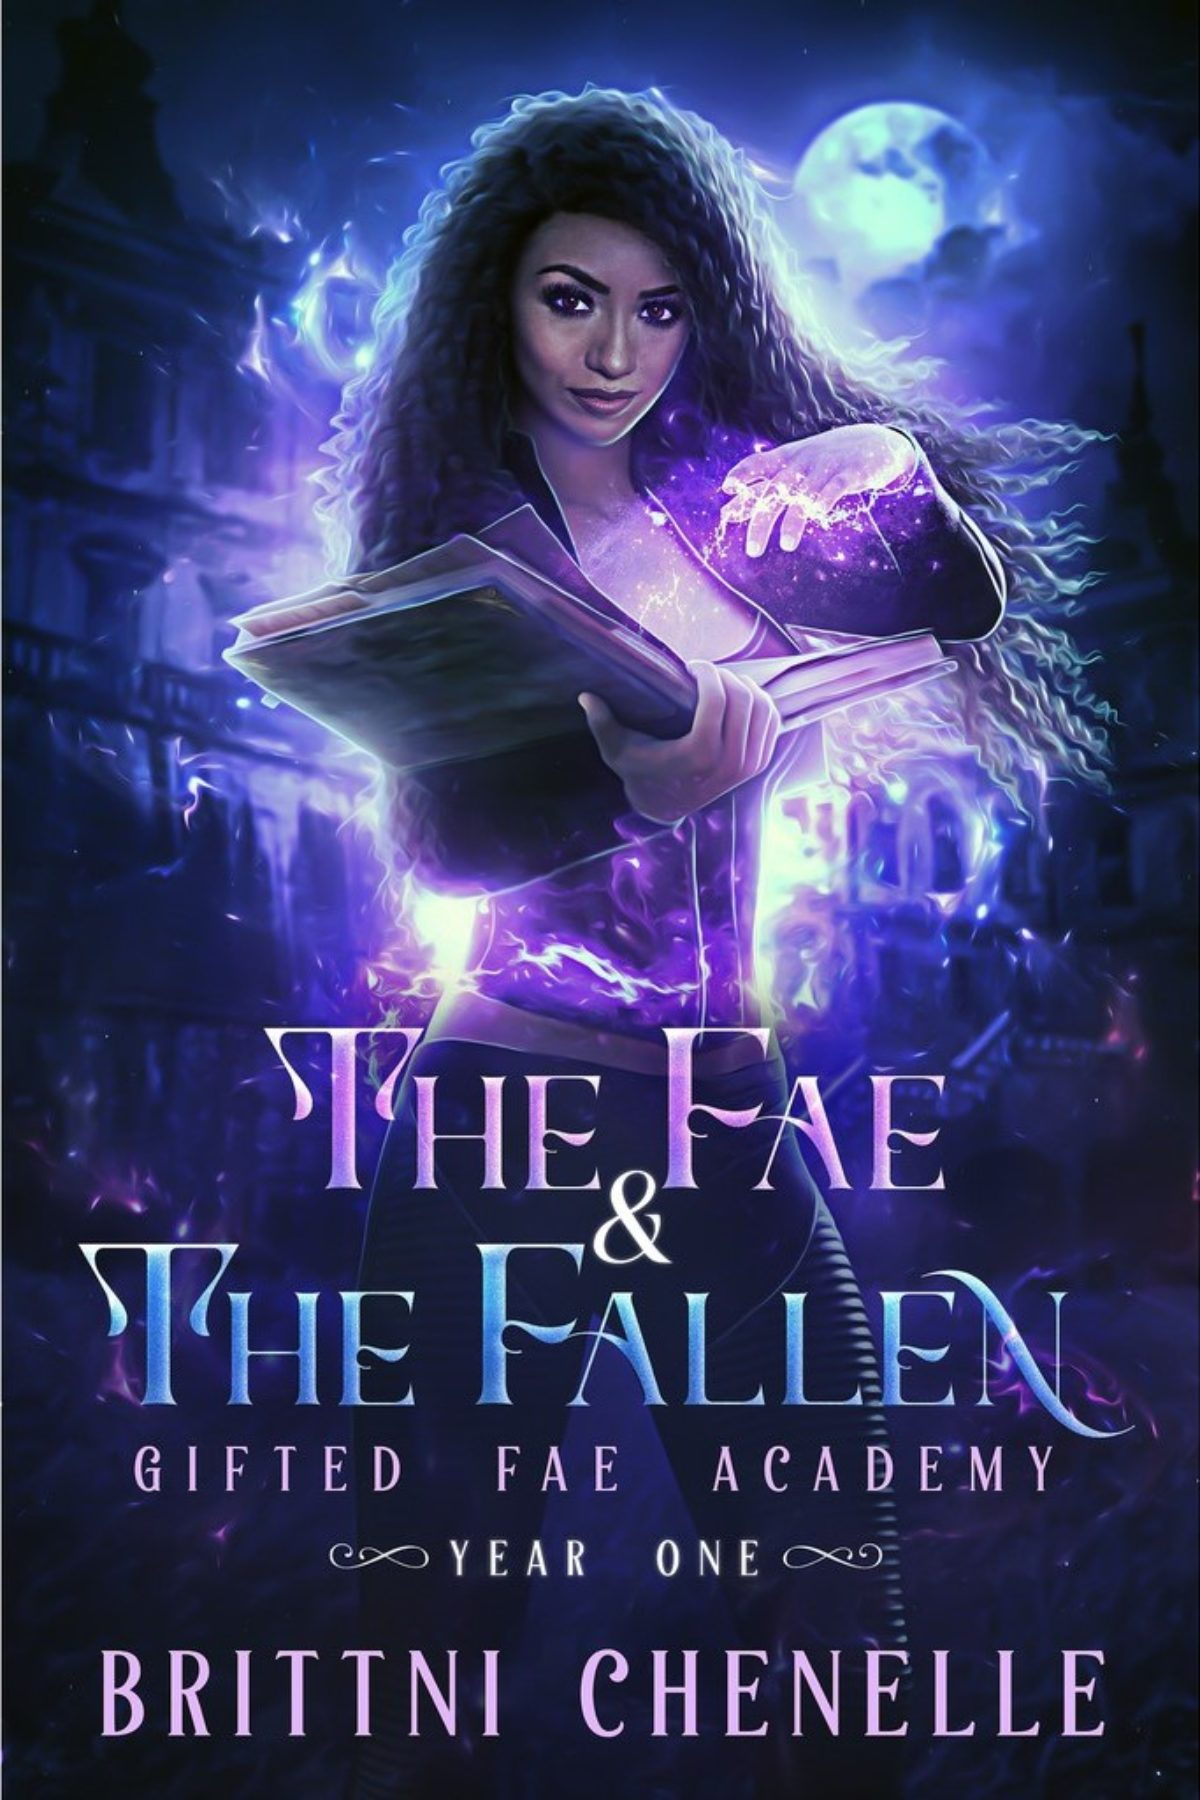 The Fae & The Fallen